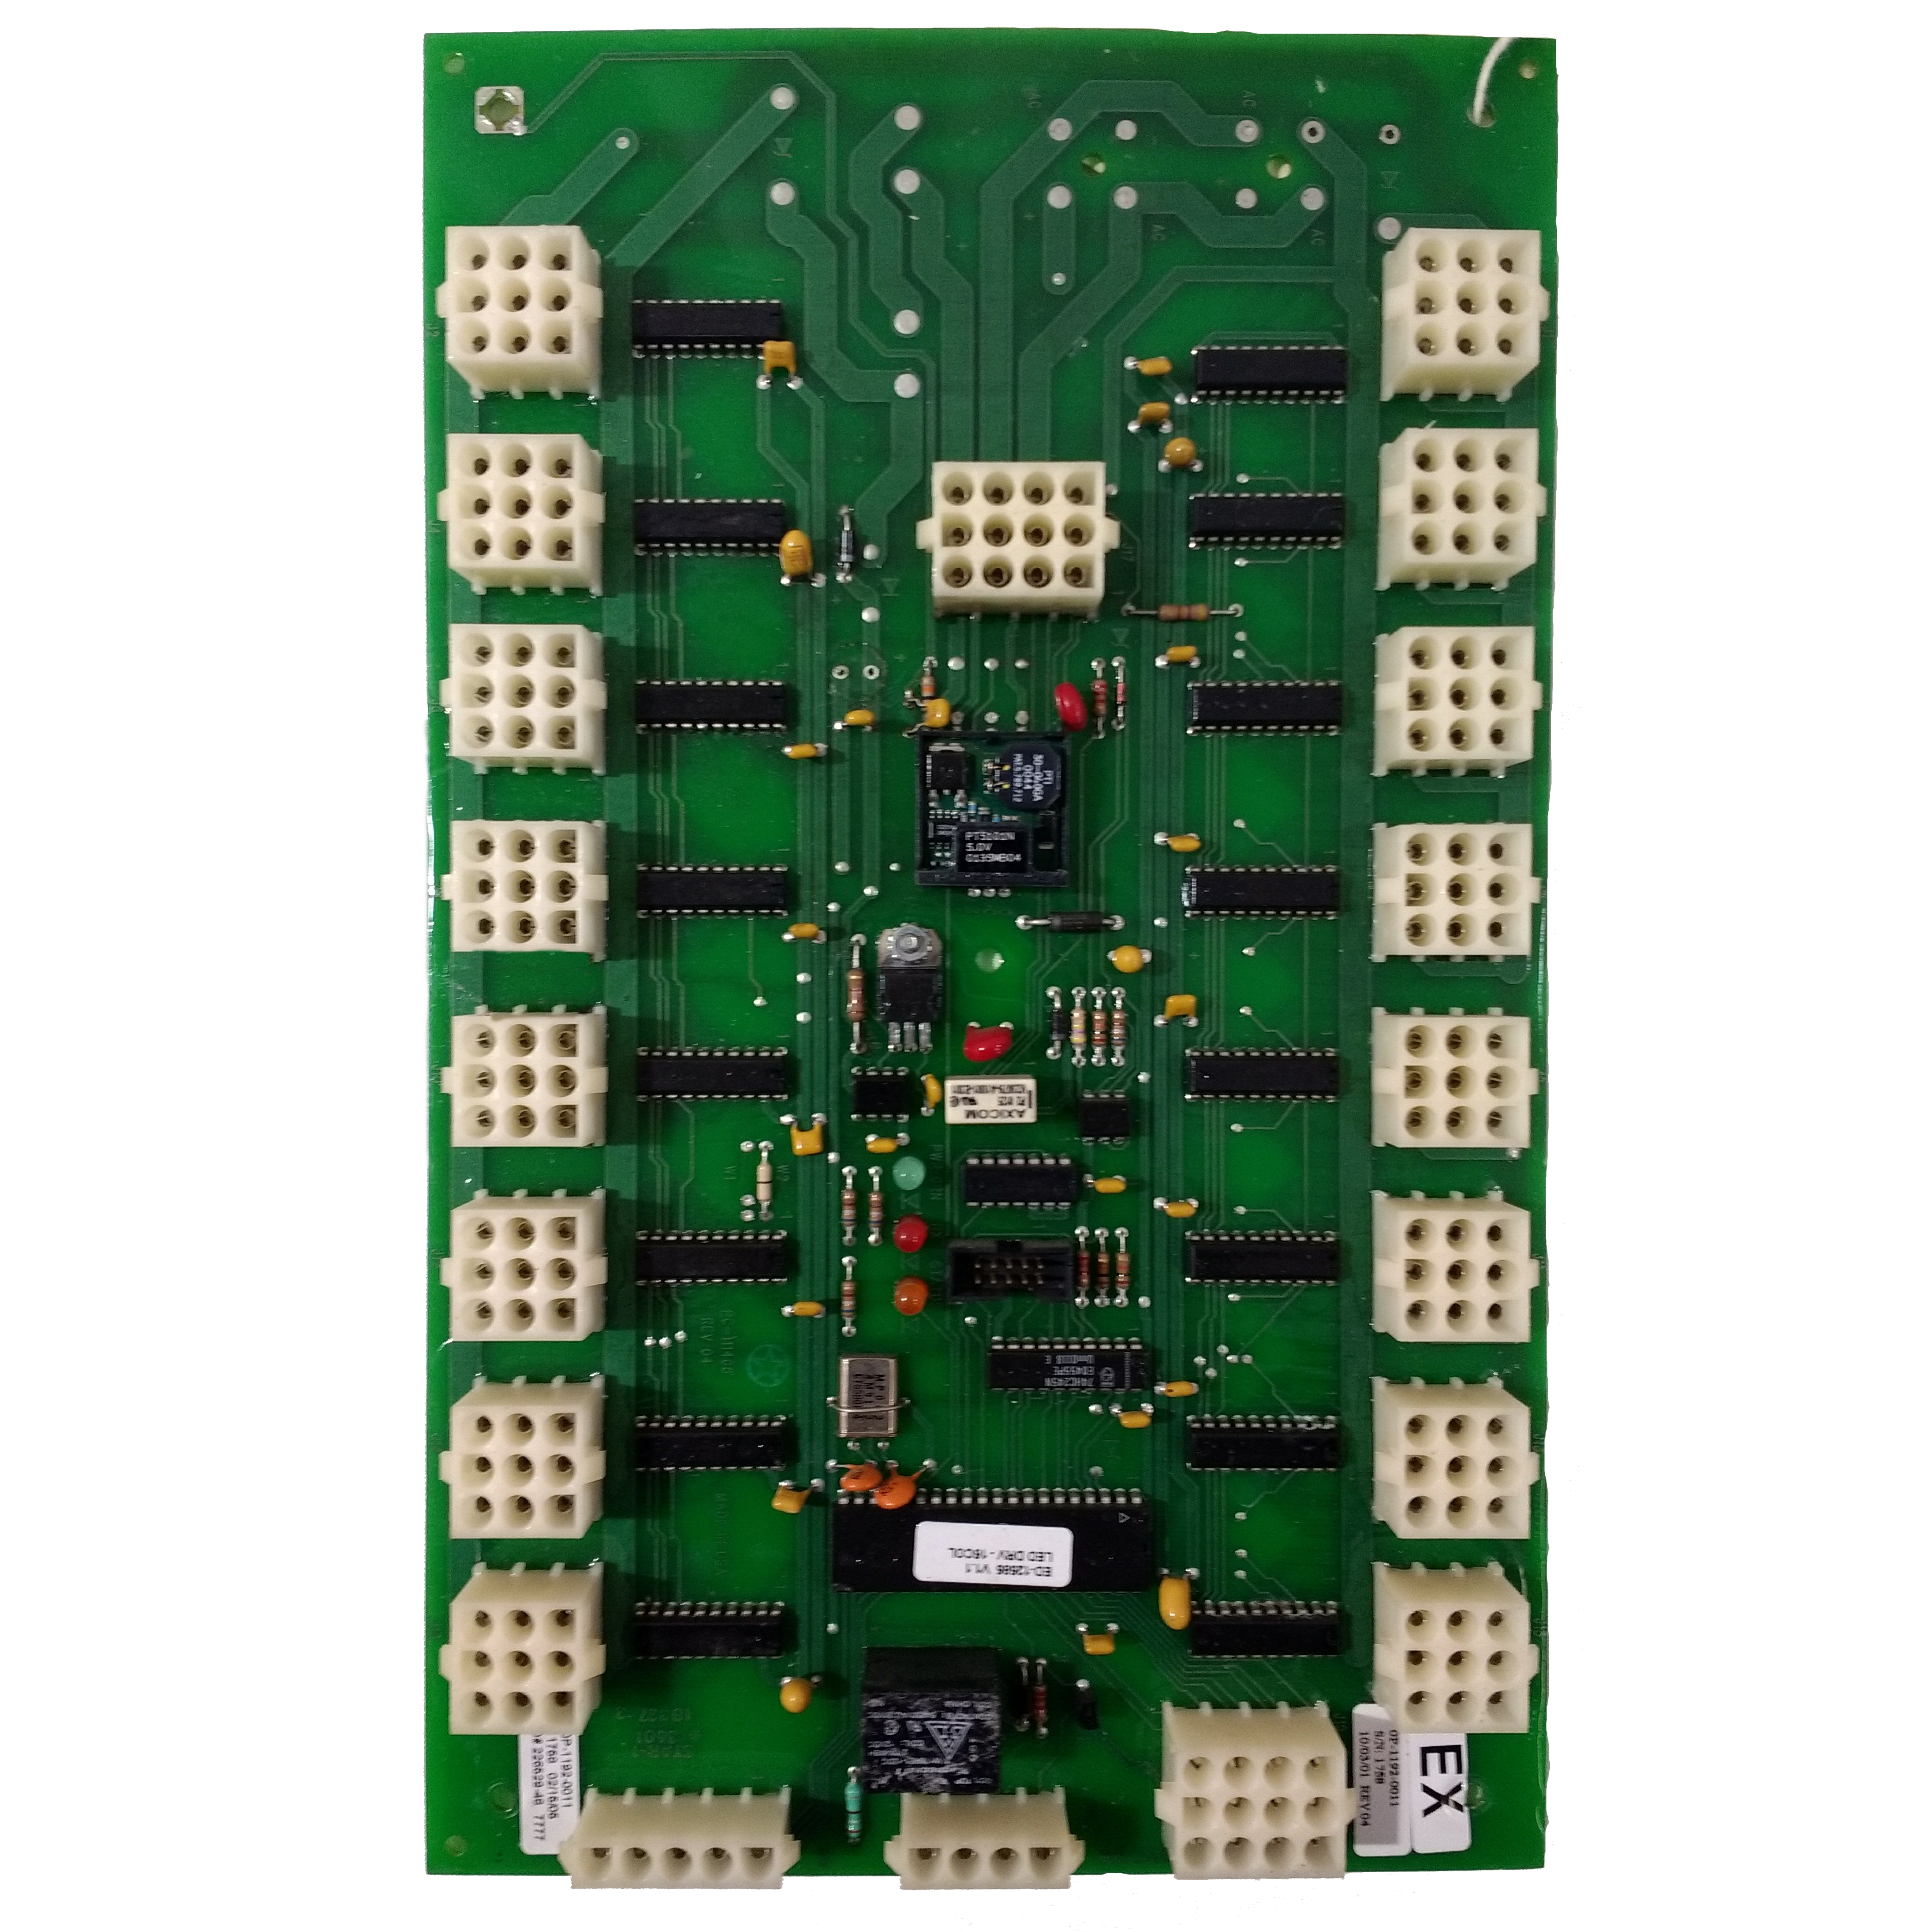 (0P-1192-0011) Daktronics 16 Output Outdoor LED Driver (Refurbished)